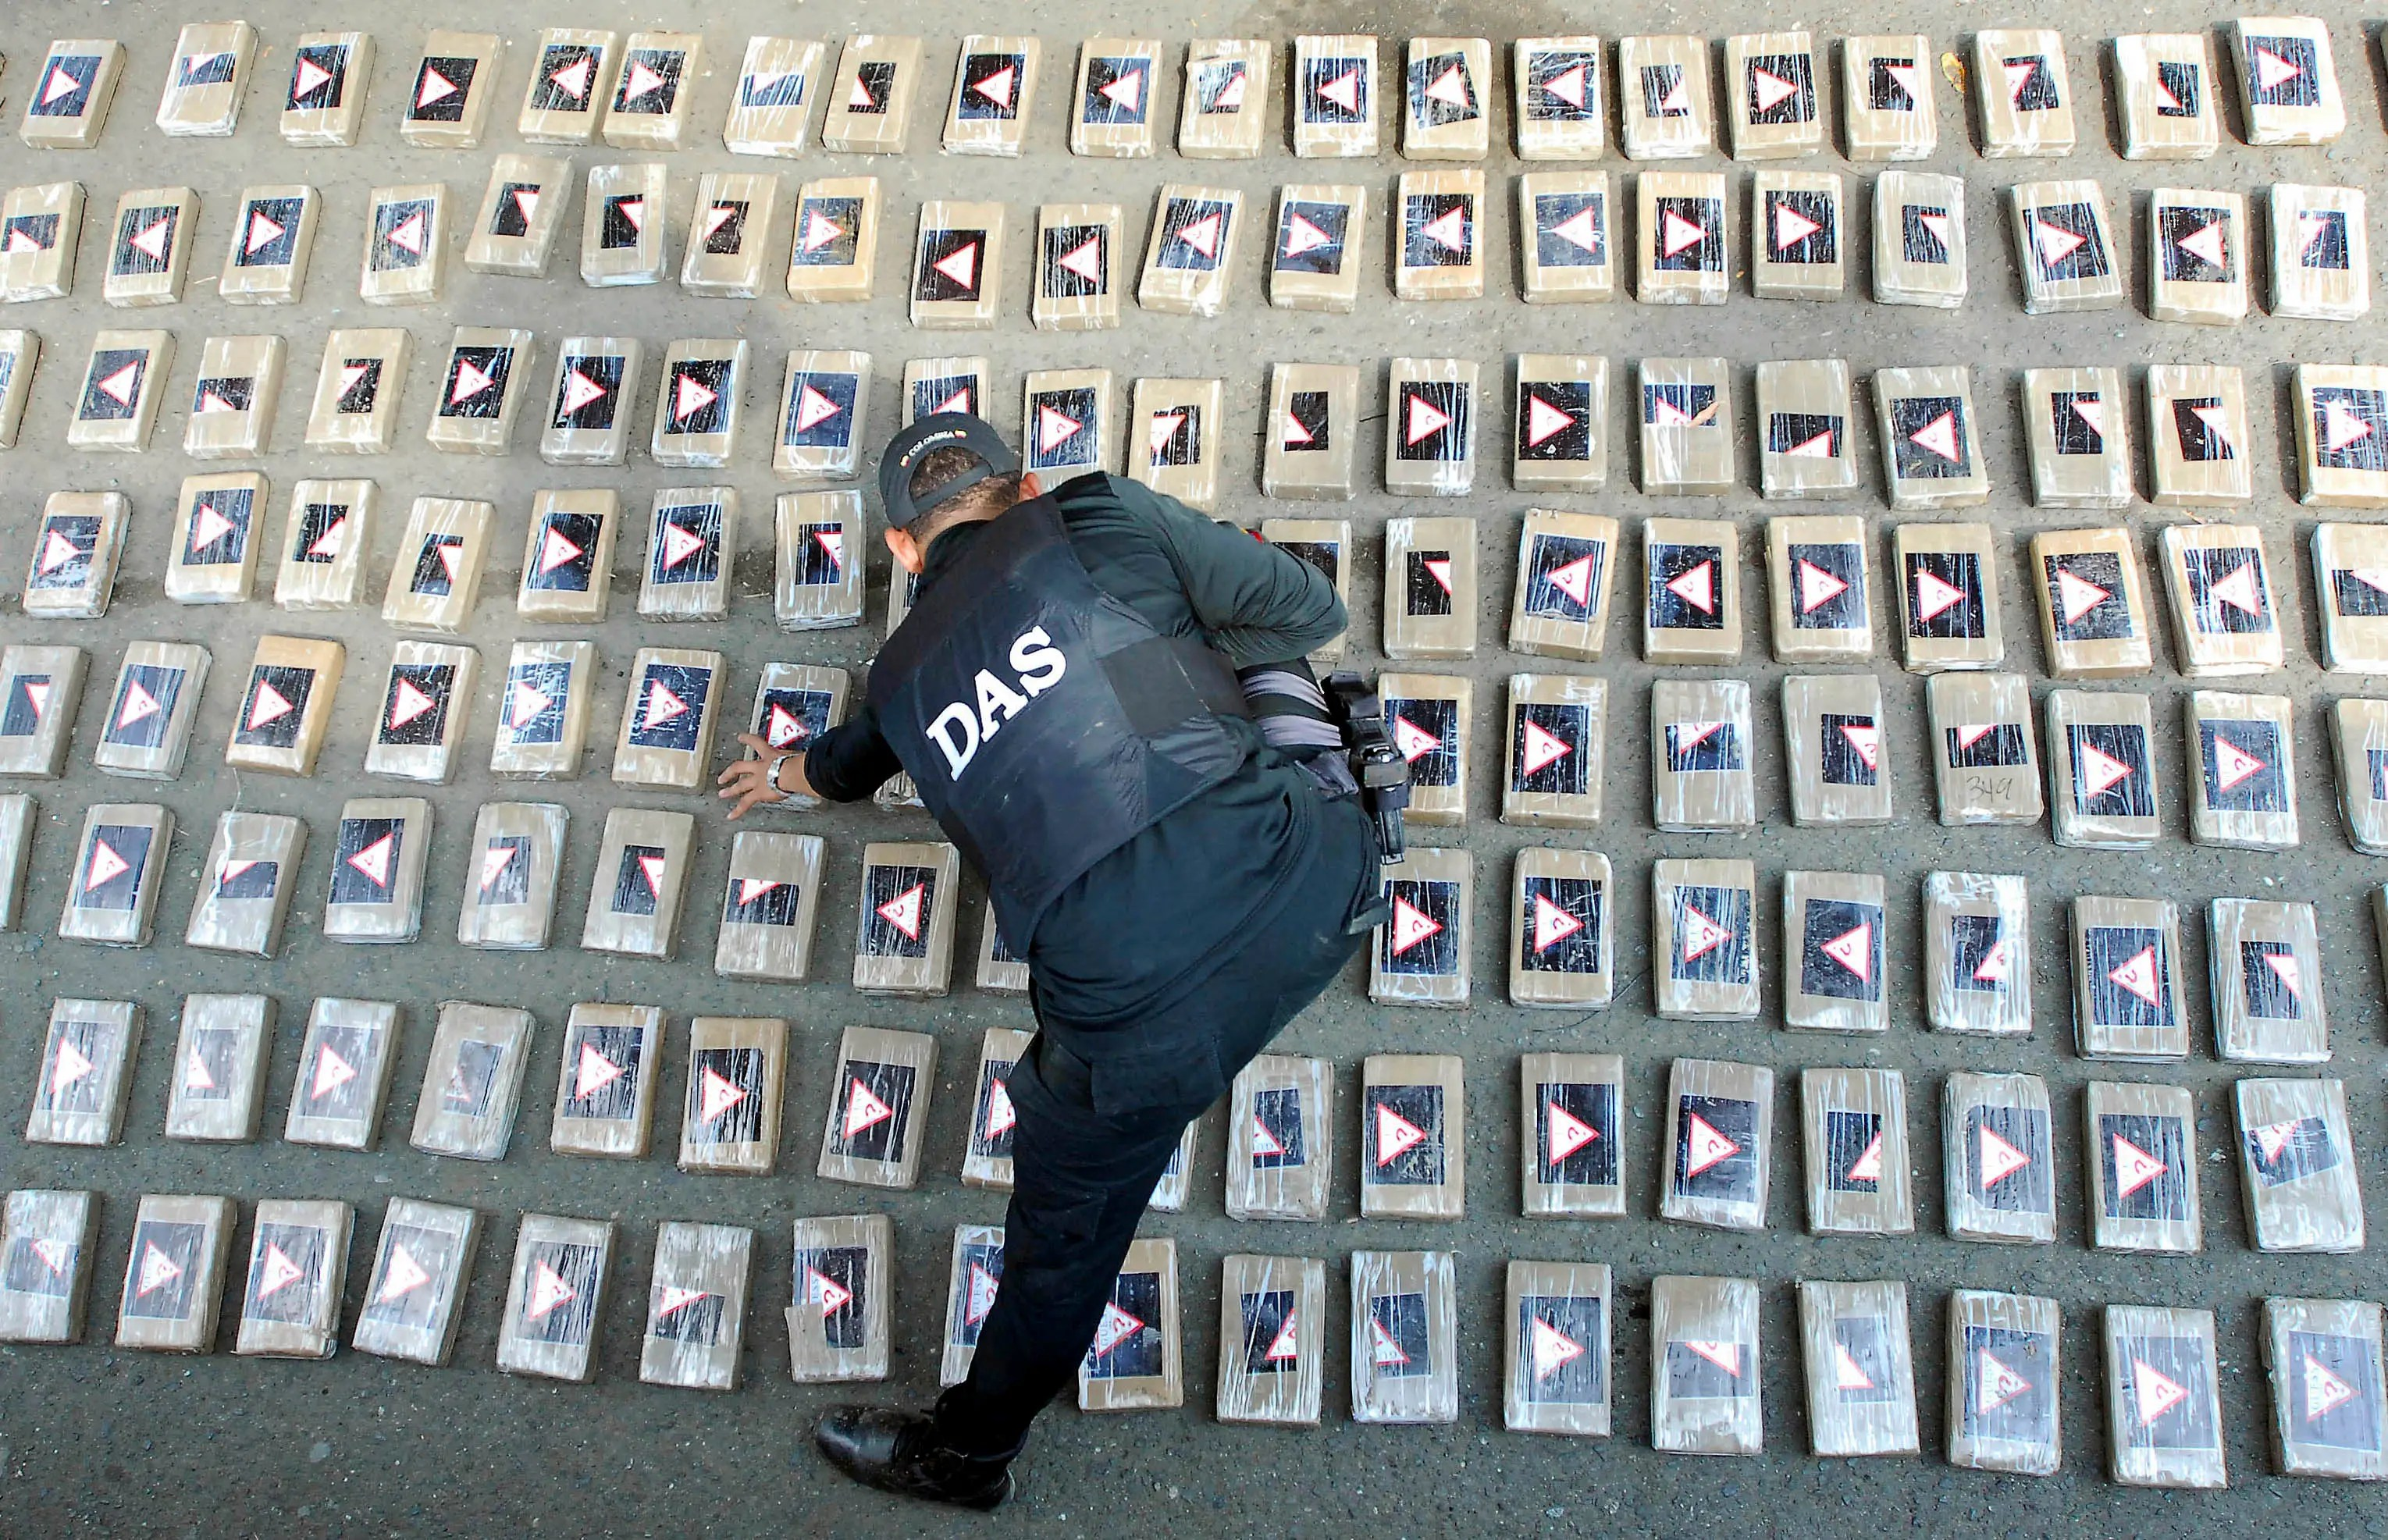 Colombia cocaine shipment seizure